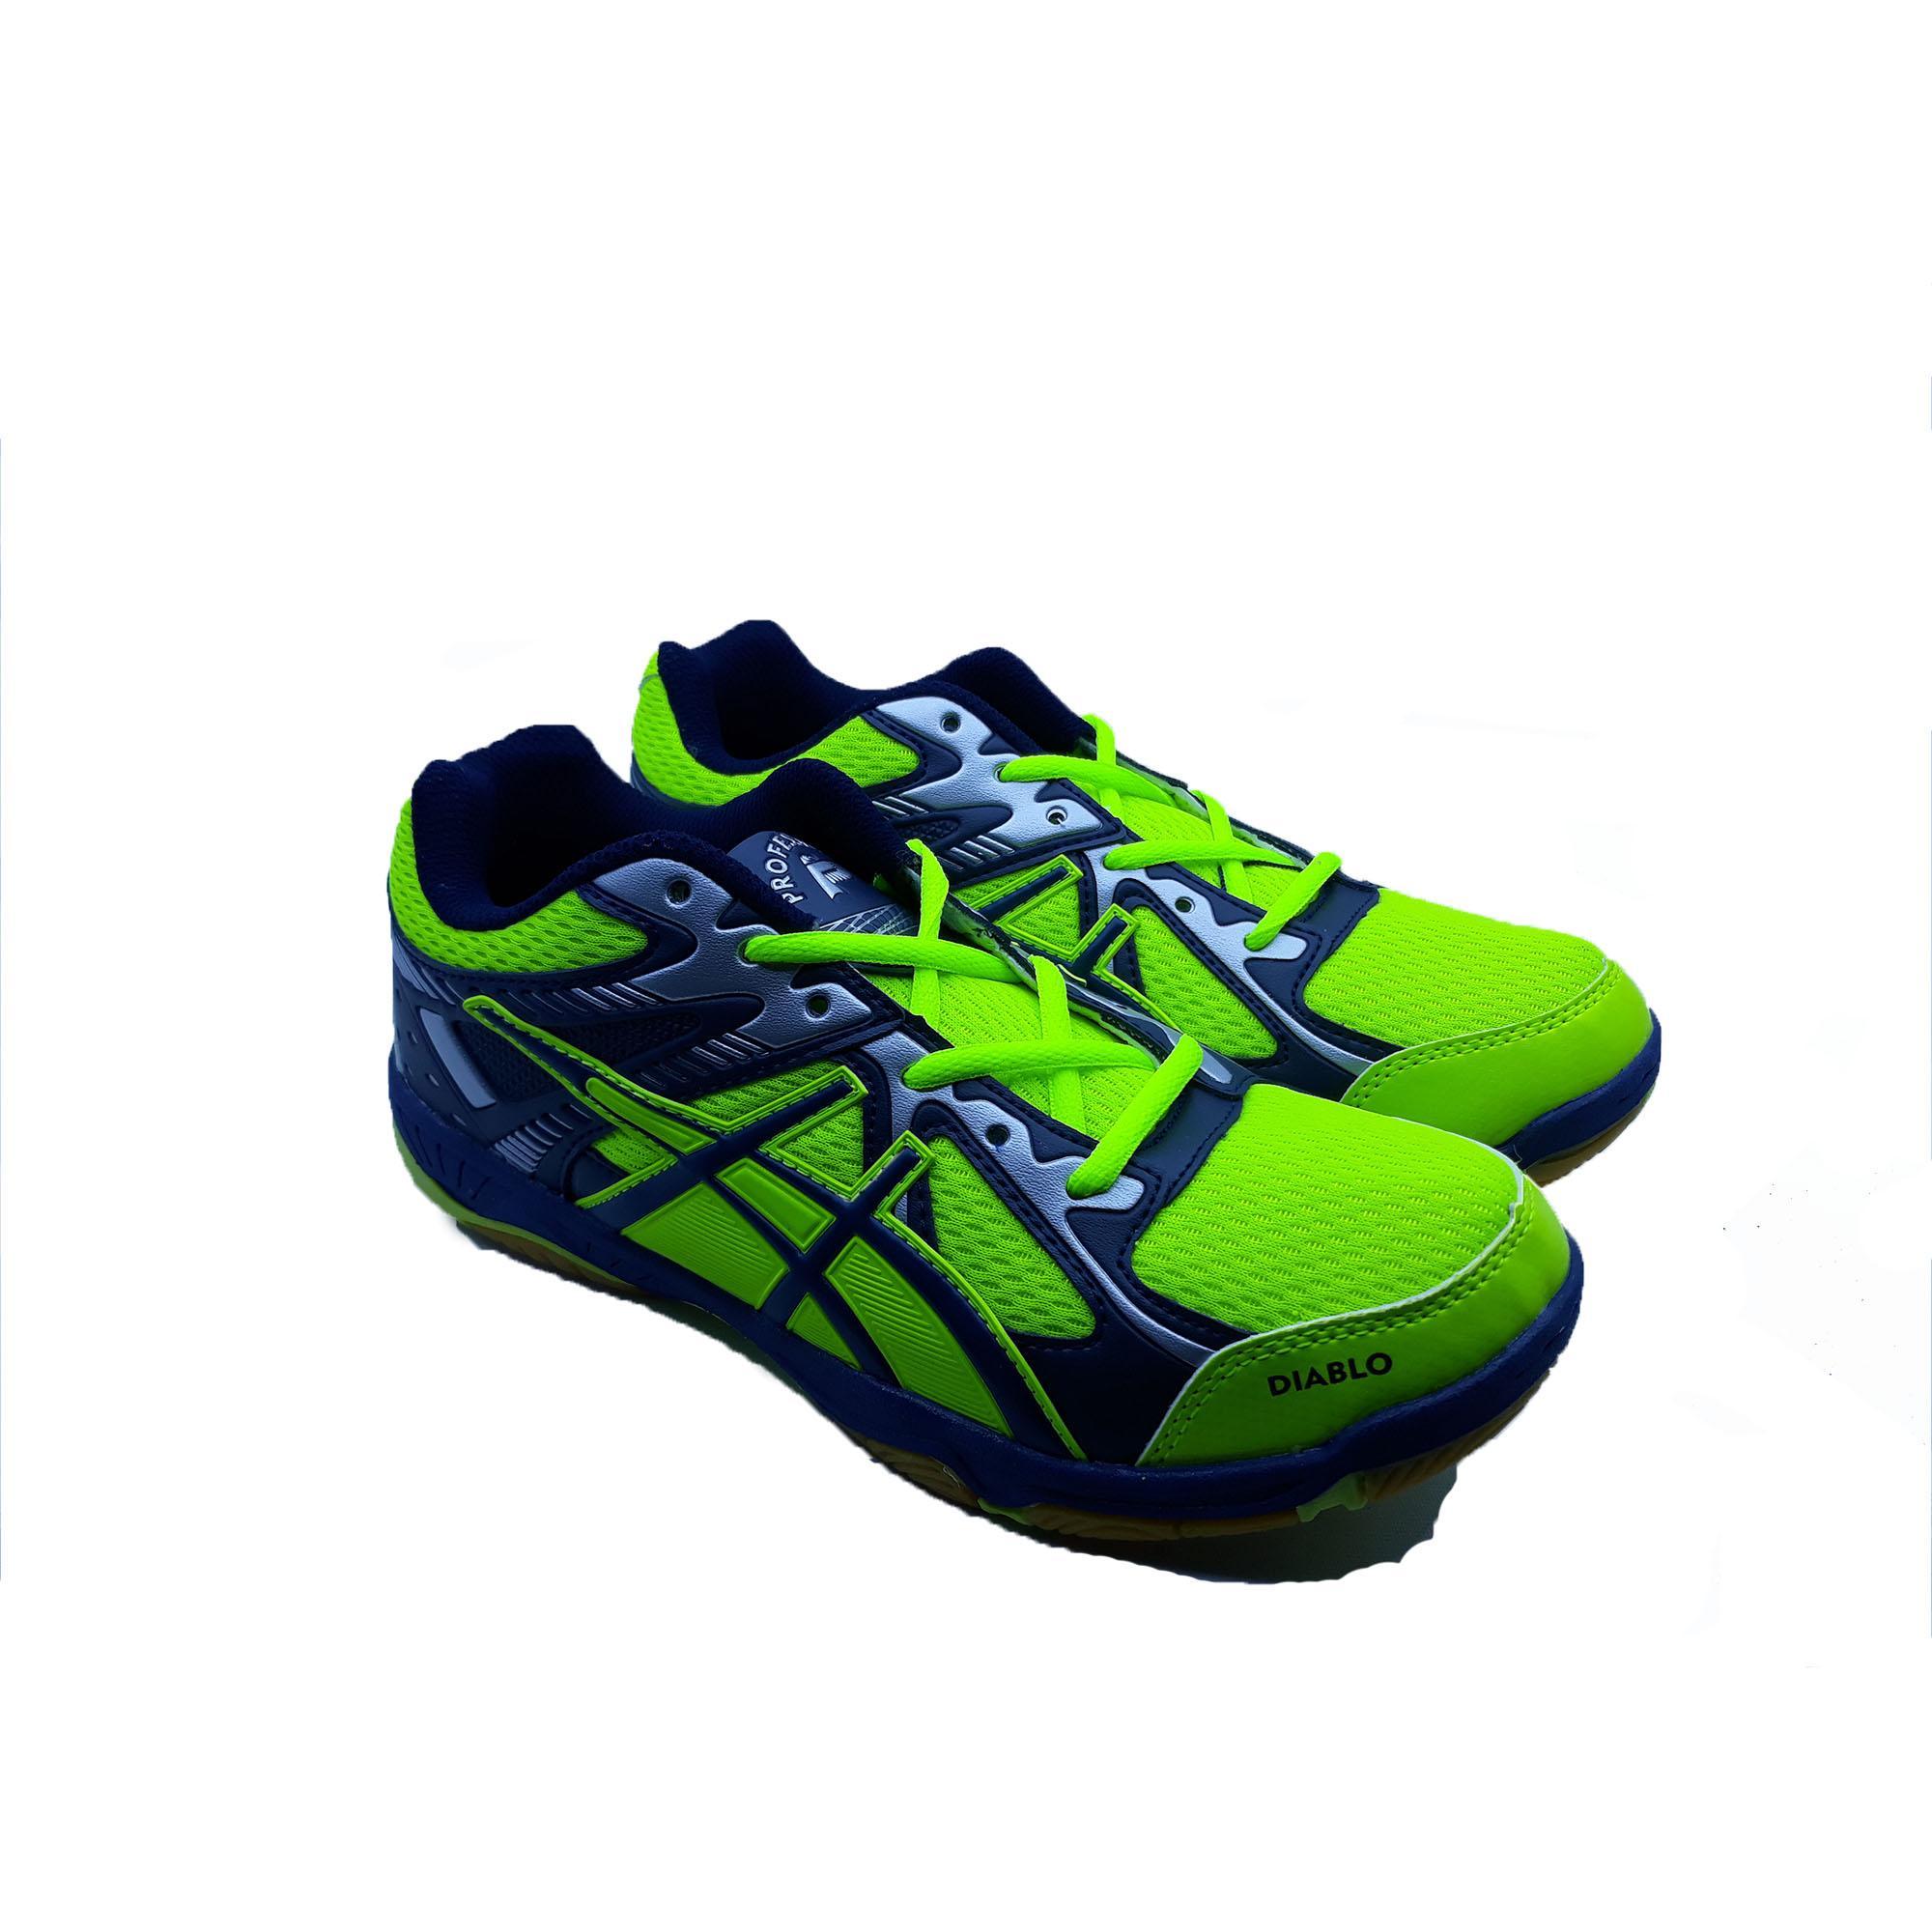 Sepatu Olahraga Badminton Professional Diablo - Neon Green Navy Silver cfb27c5758